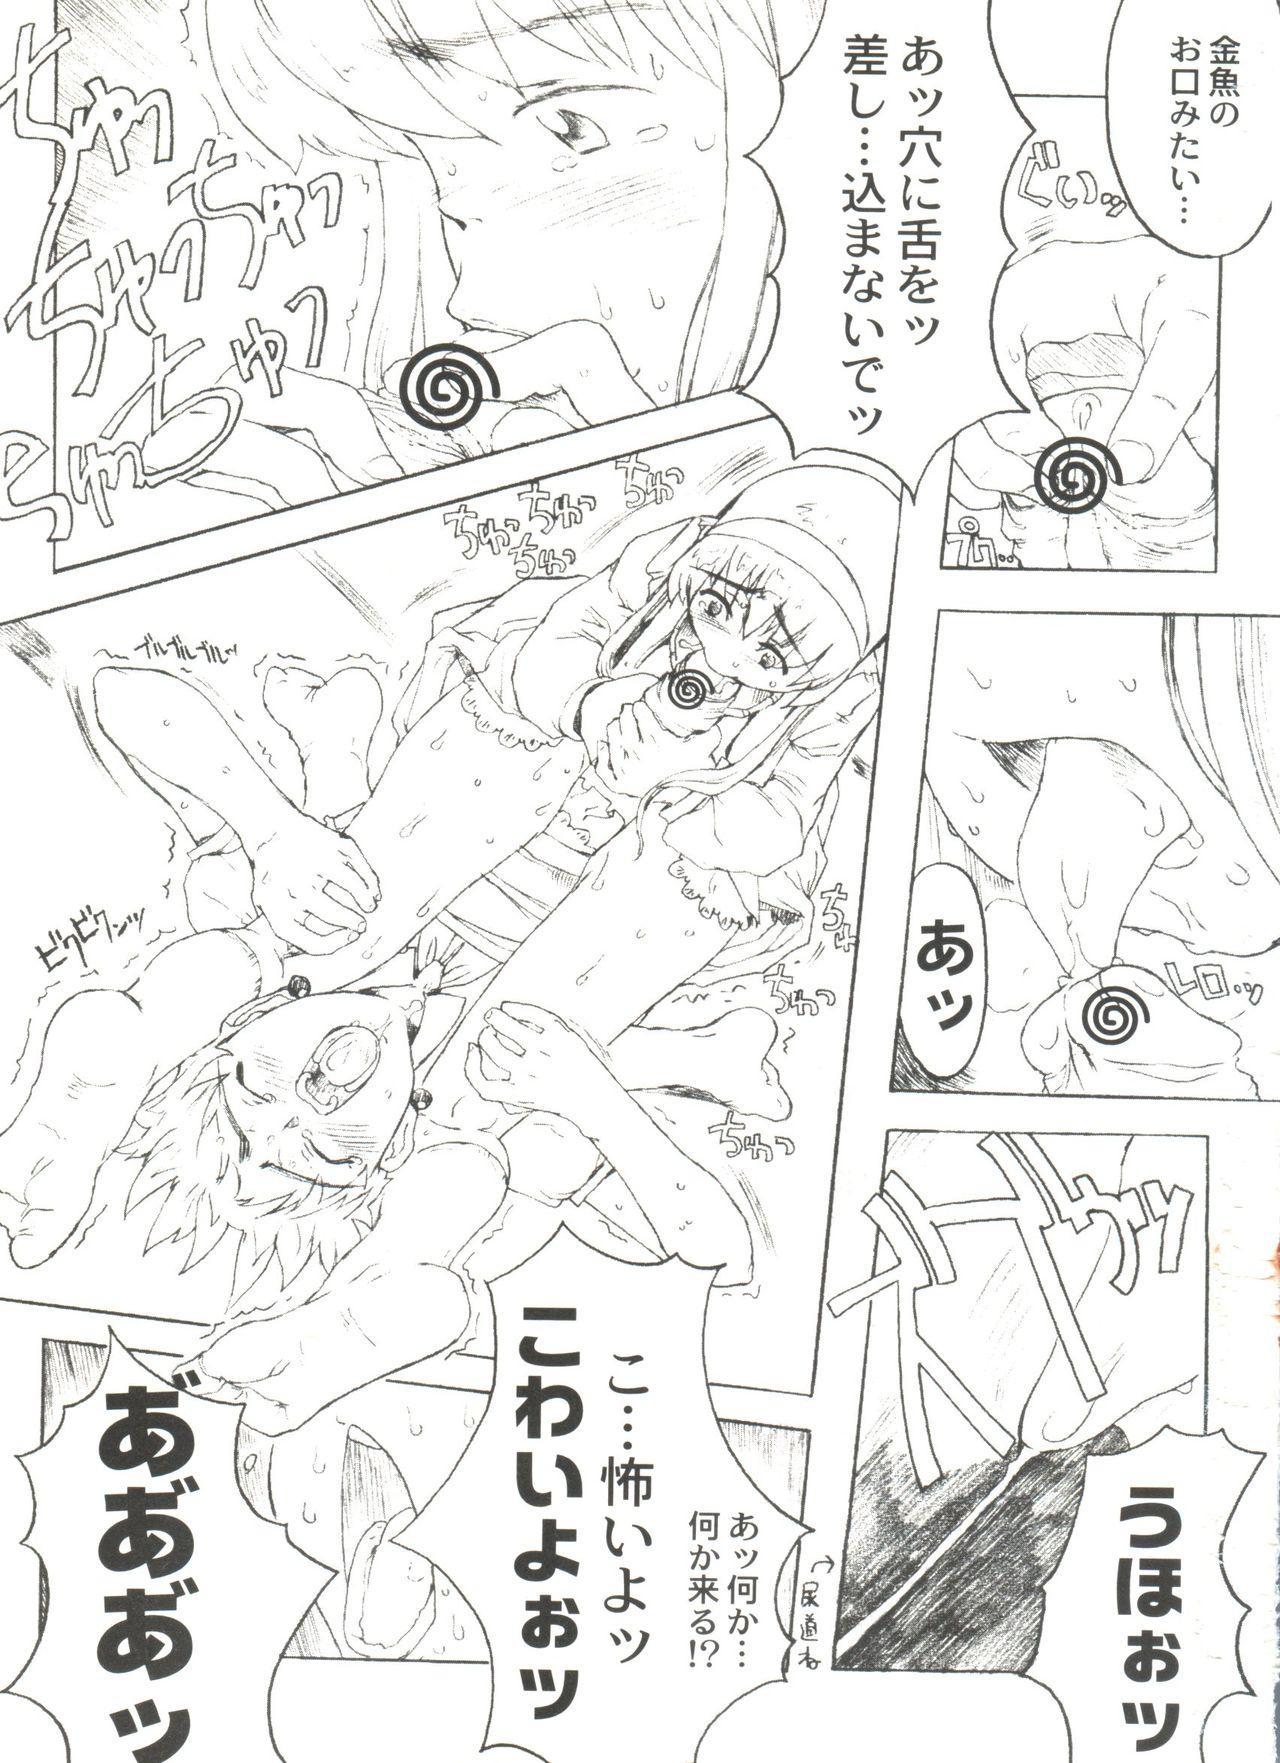 [Anthology] Denei Tamatebako 8 - Utakata no Tenshi-tachi II (Various) 82